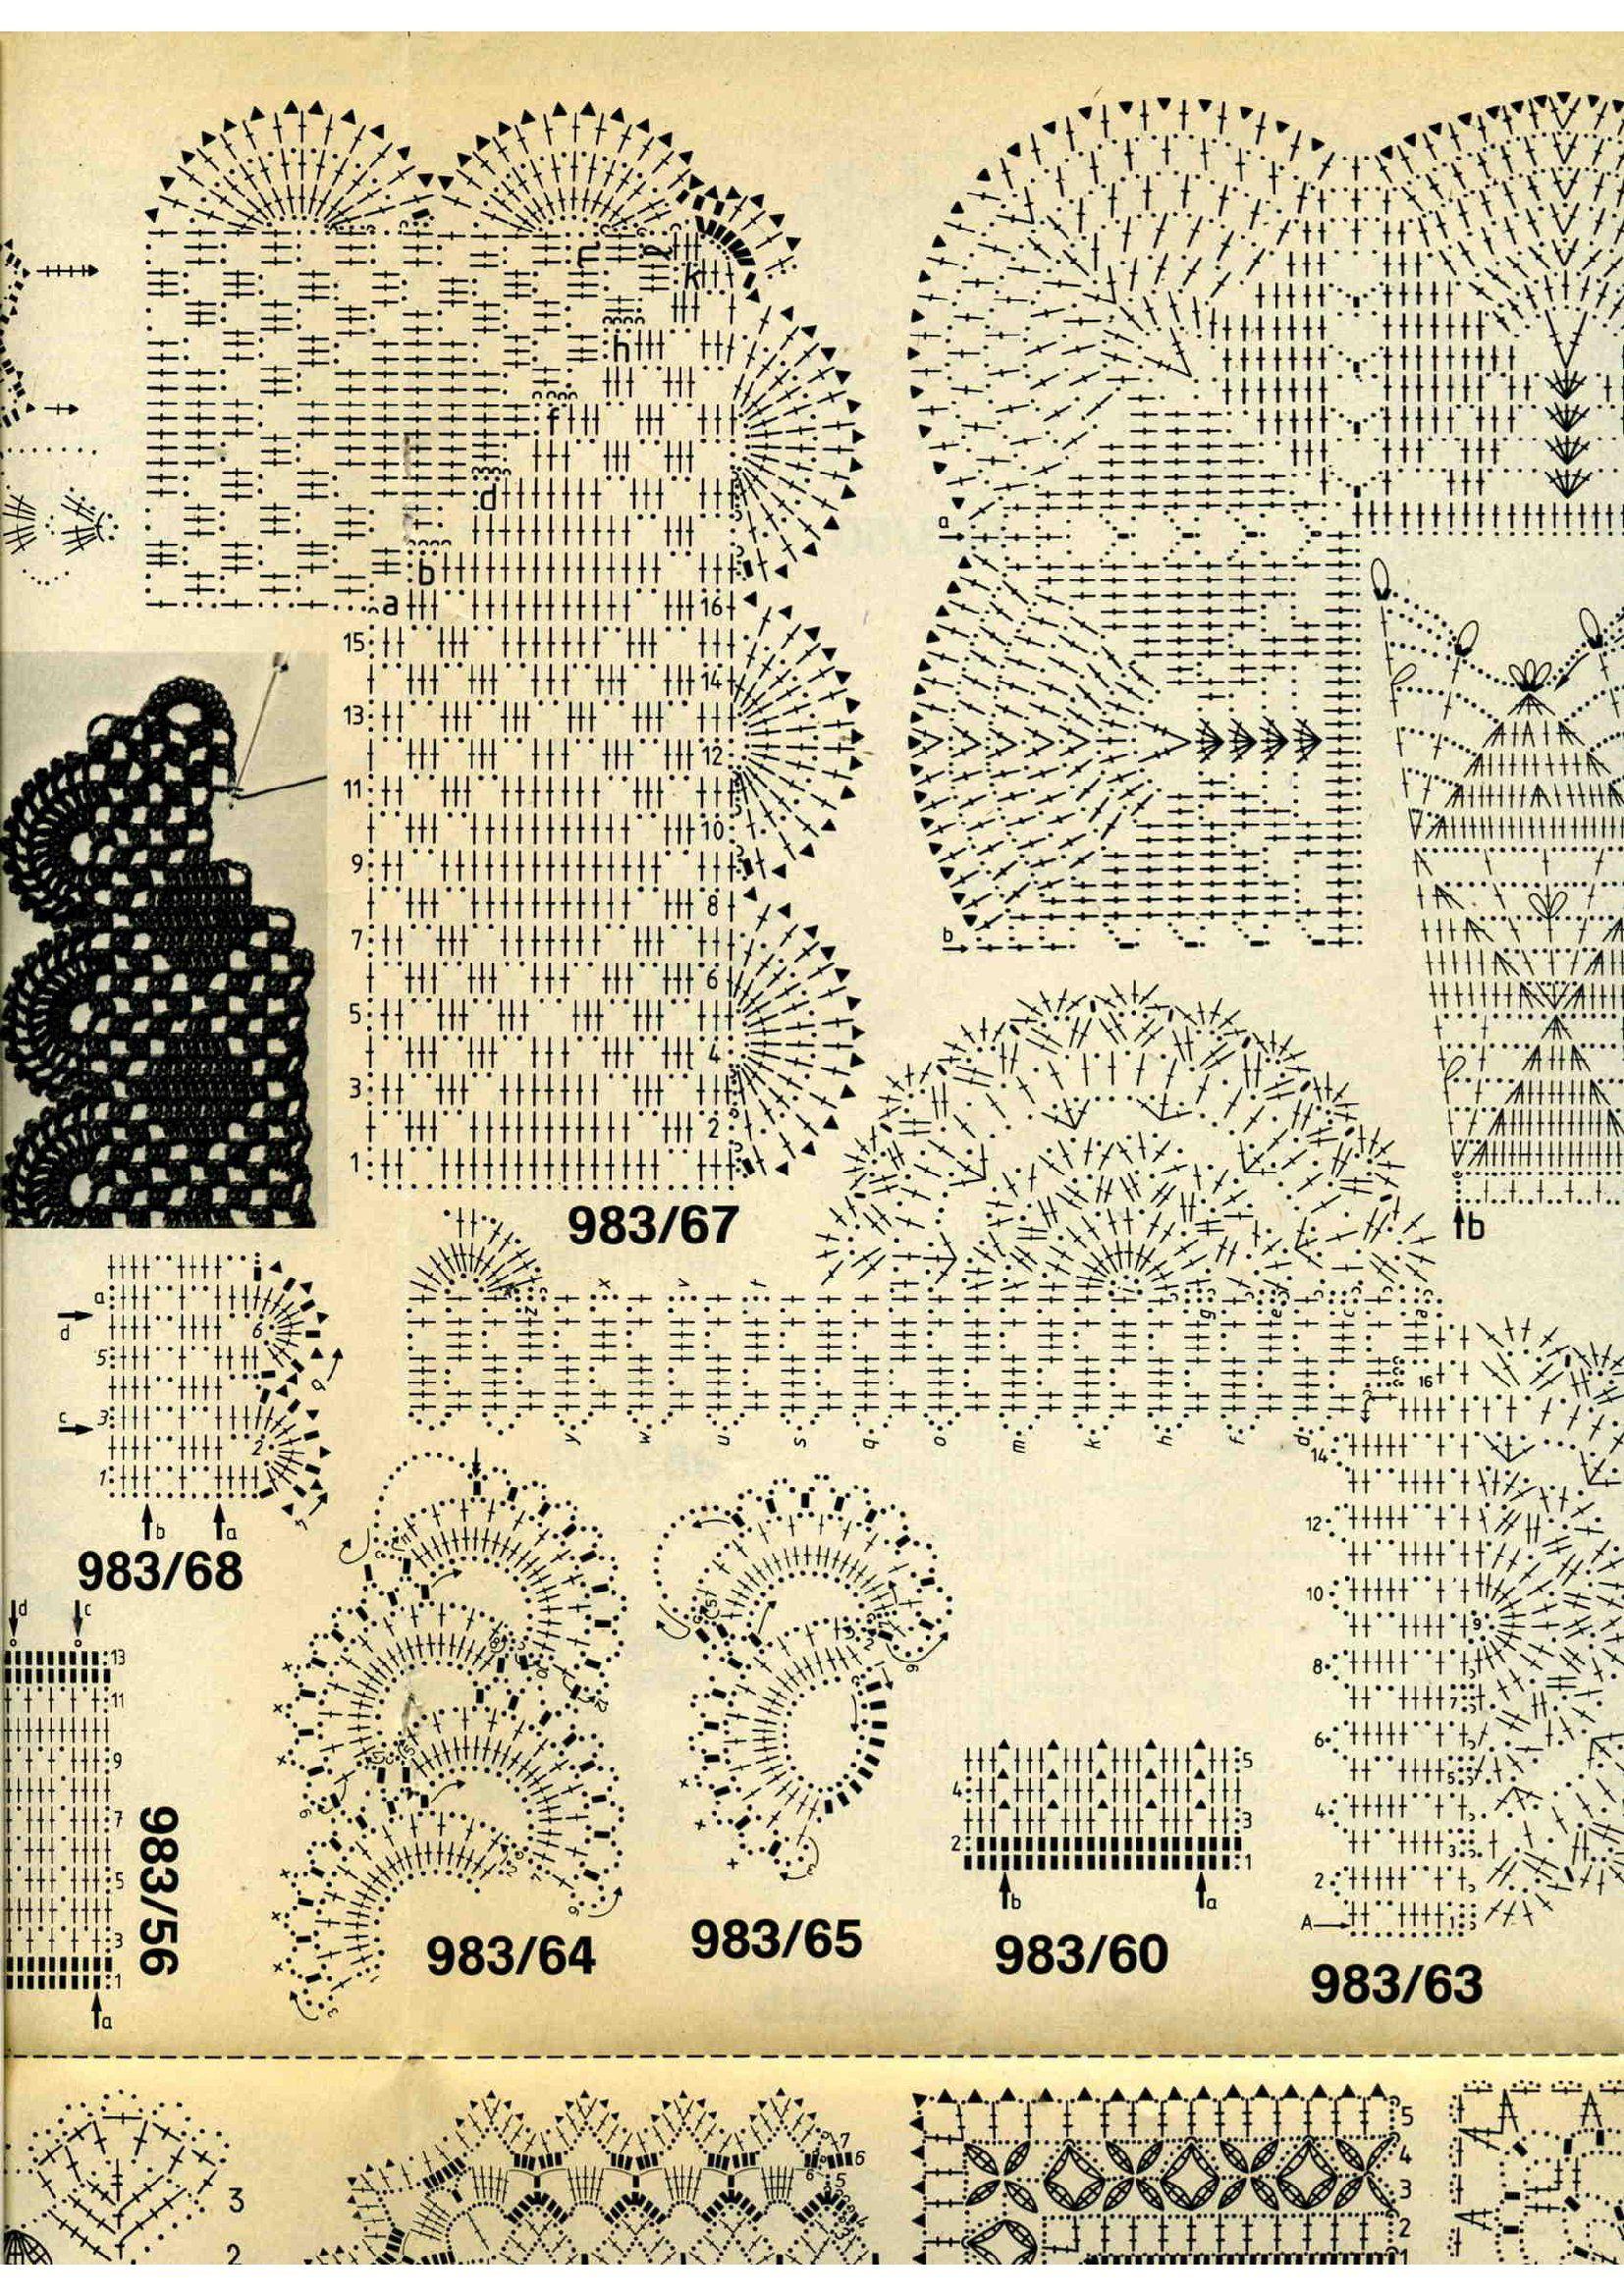 imgbox - fast, simple image host | Crochet Orillas | Pinterest ...